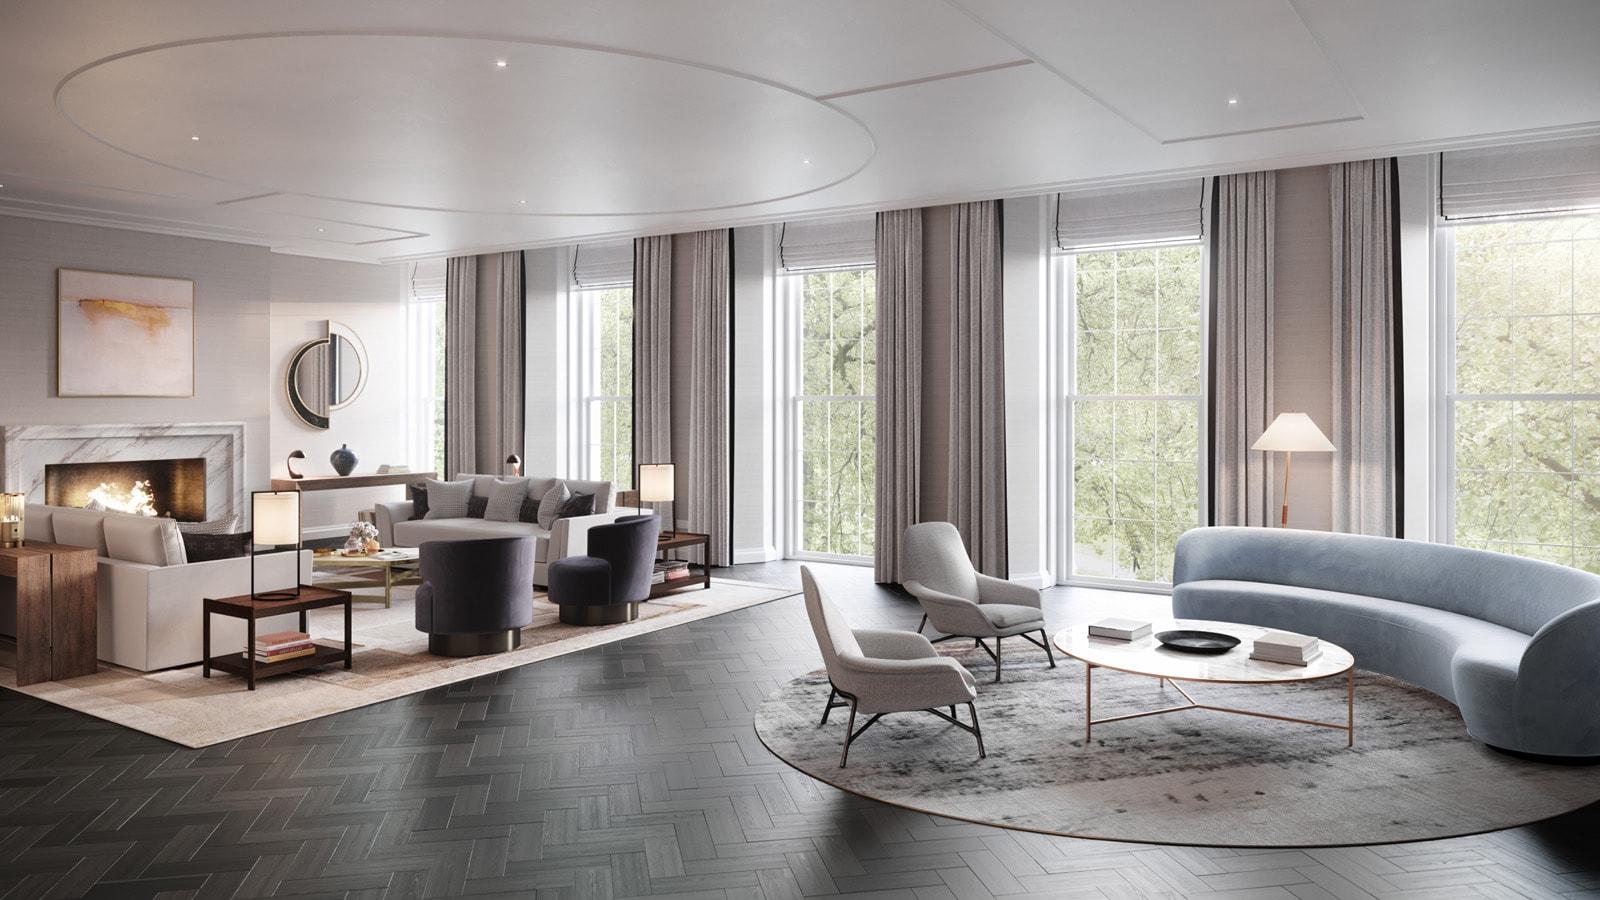 Four Seasons bringt Private Residences nach London 3